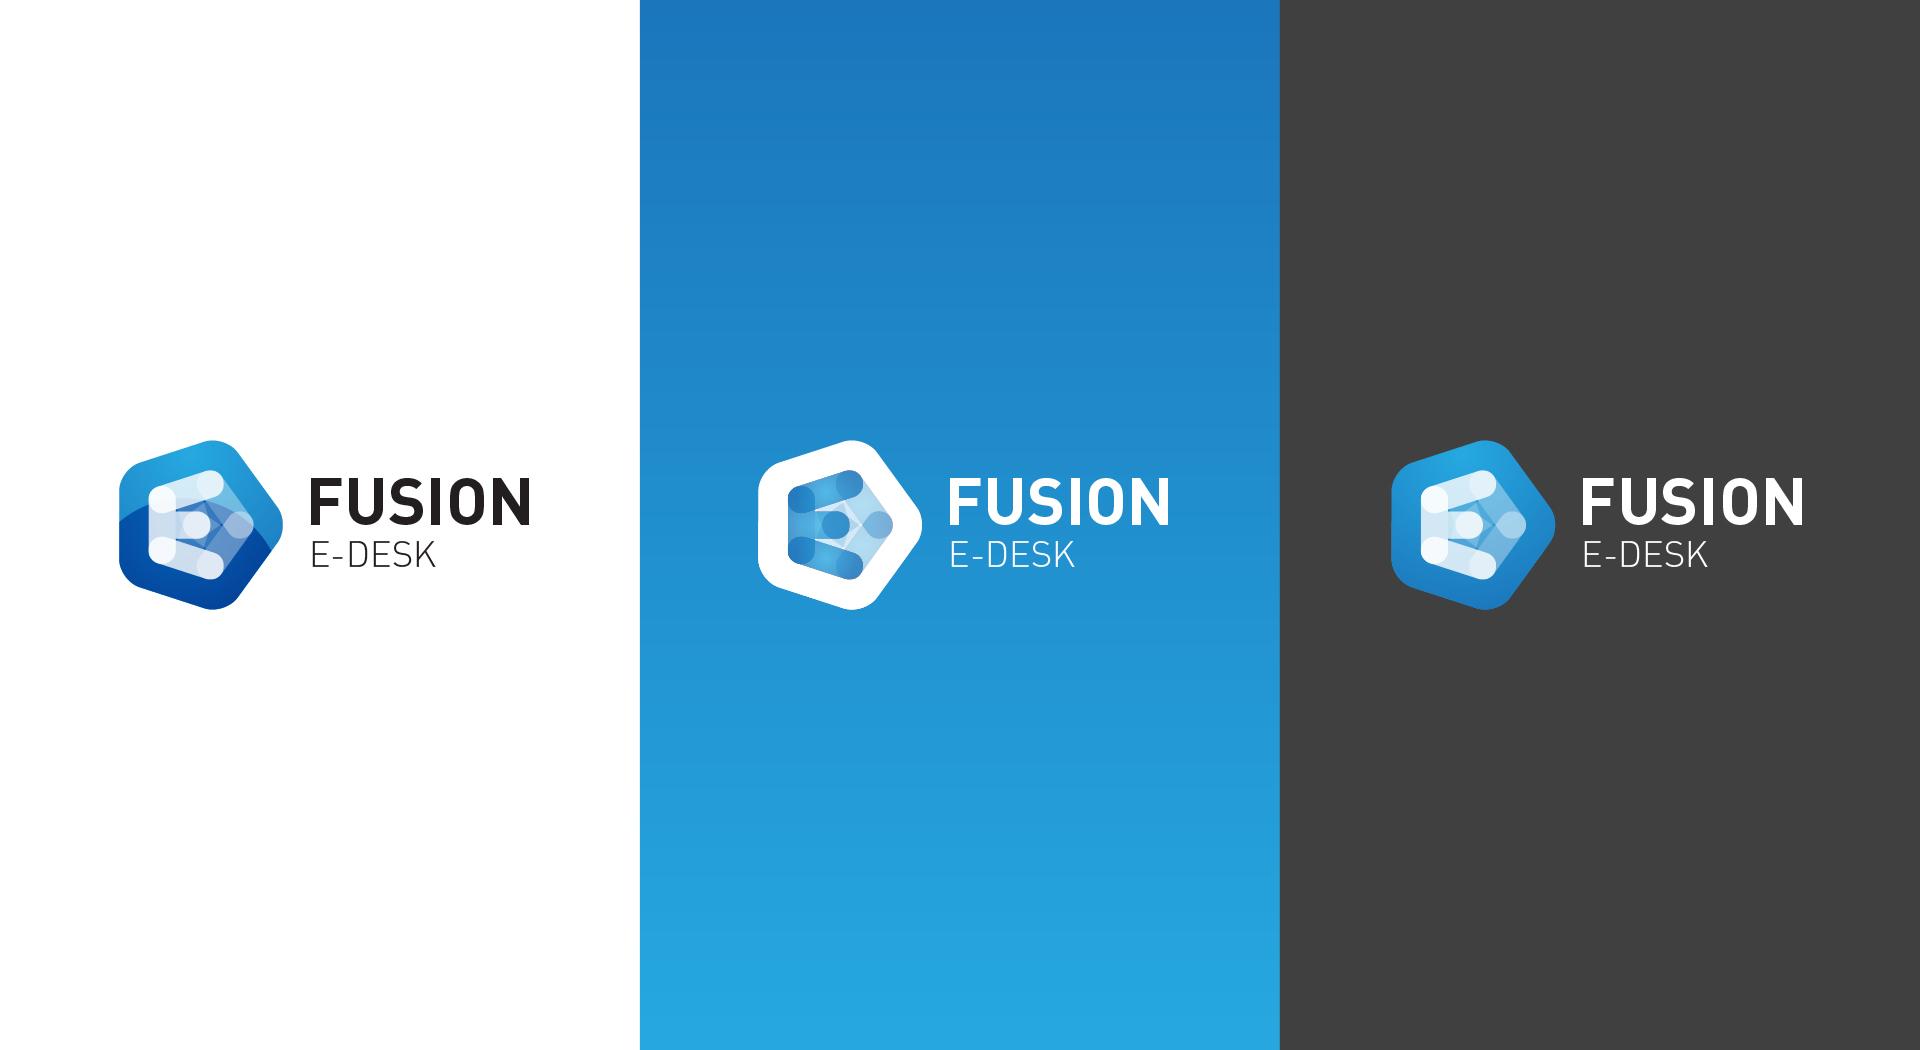 fusion6.jpg